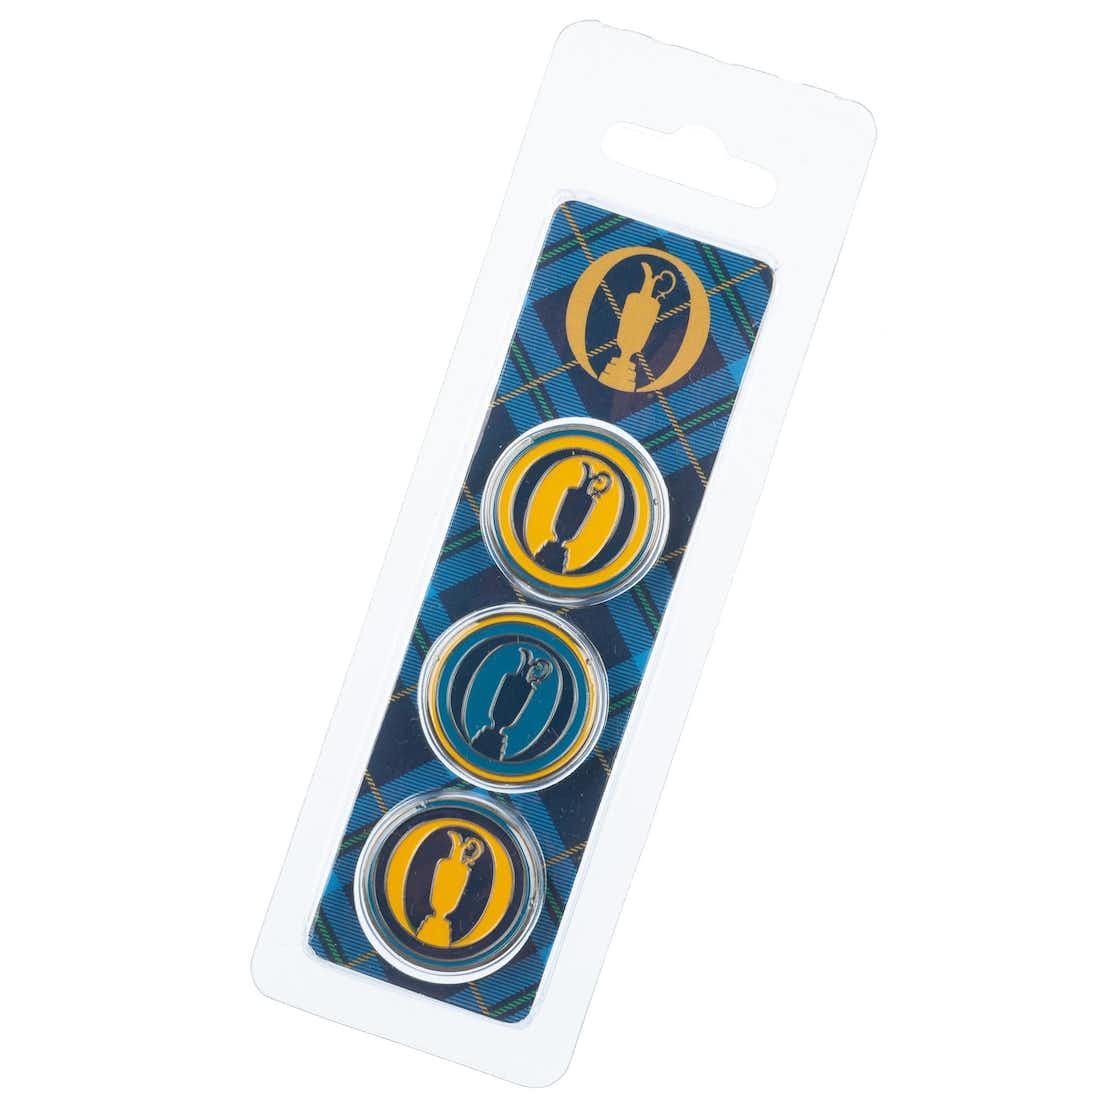 Tartan Collection Three-Ball Marker Gift Pack - Tartan